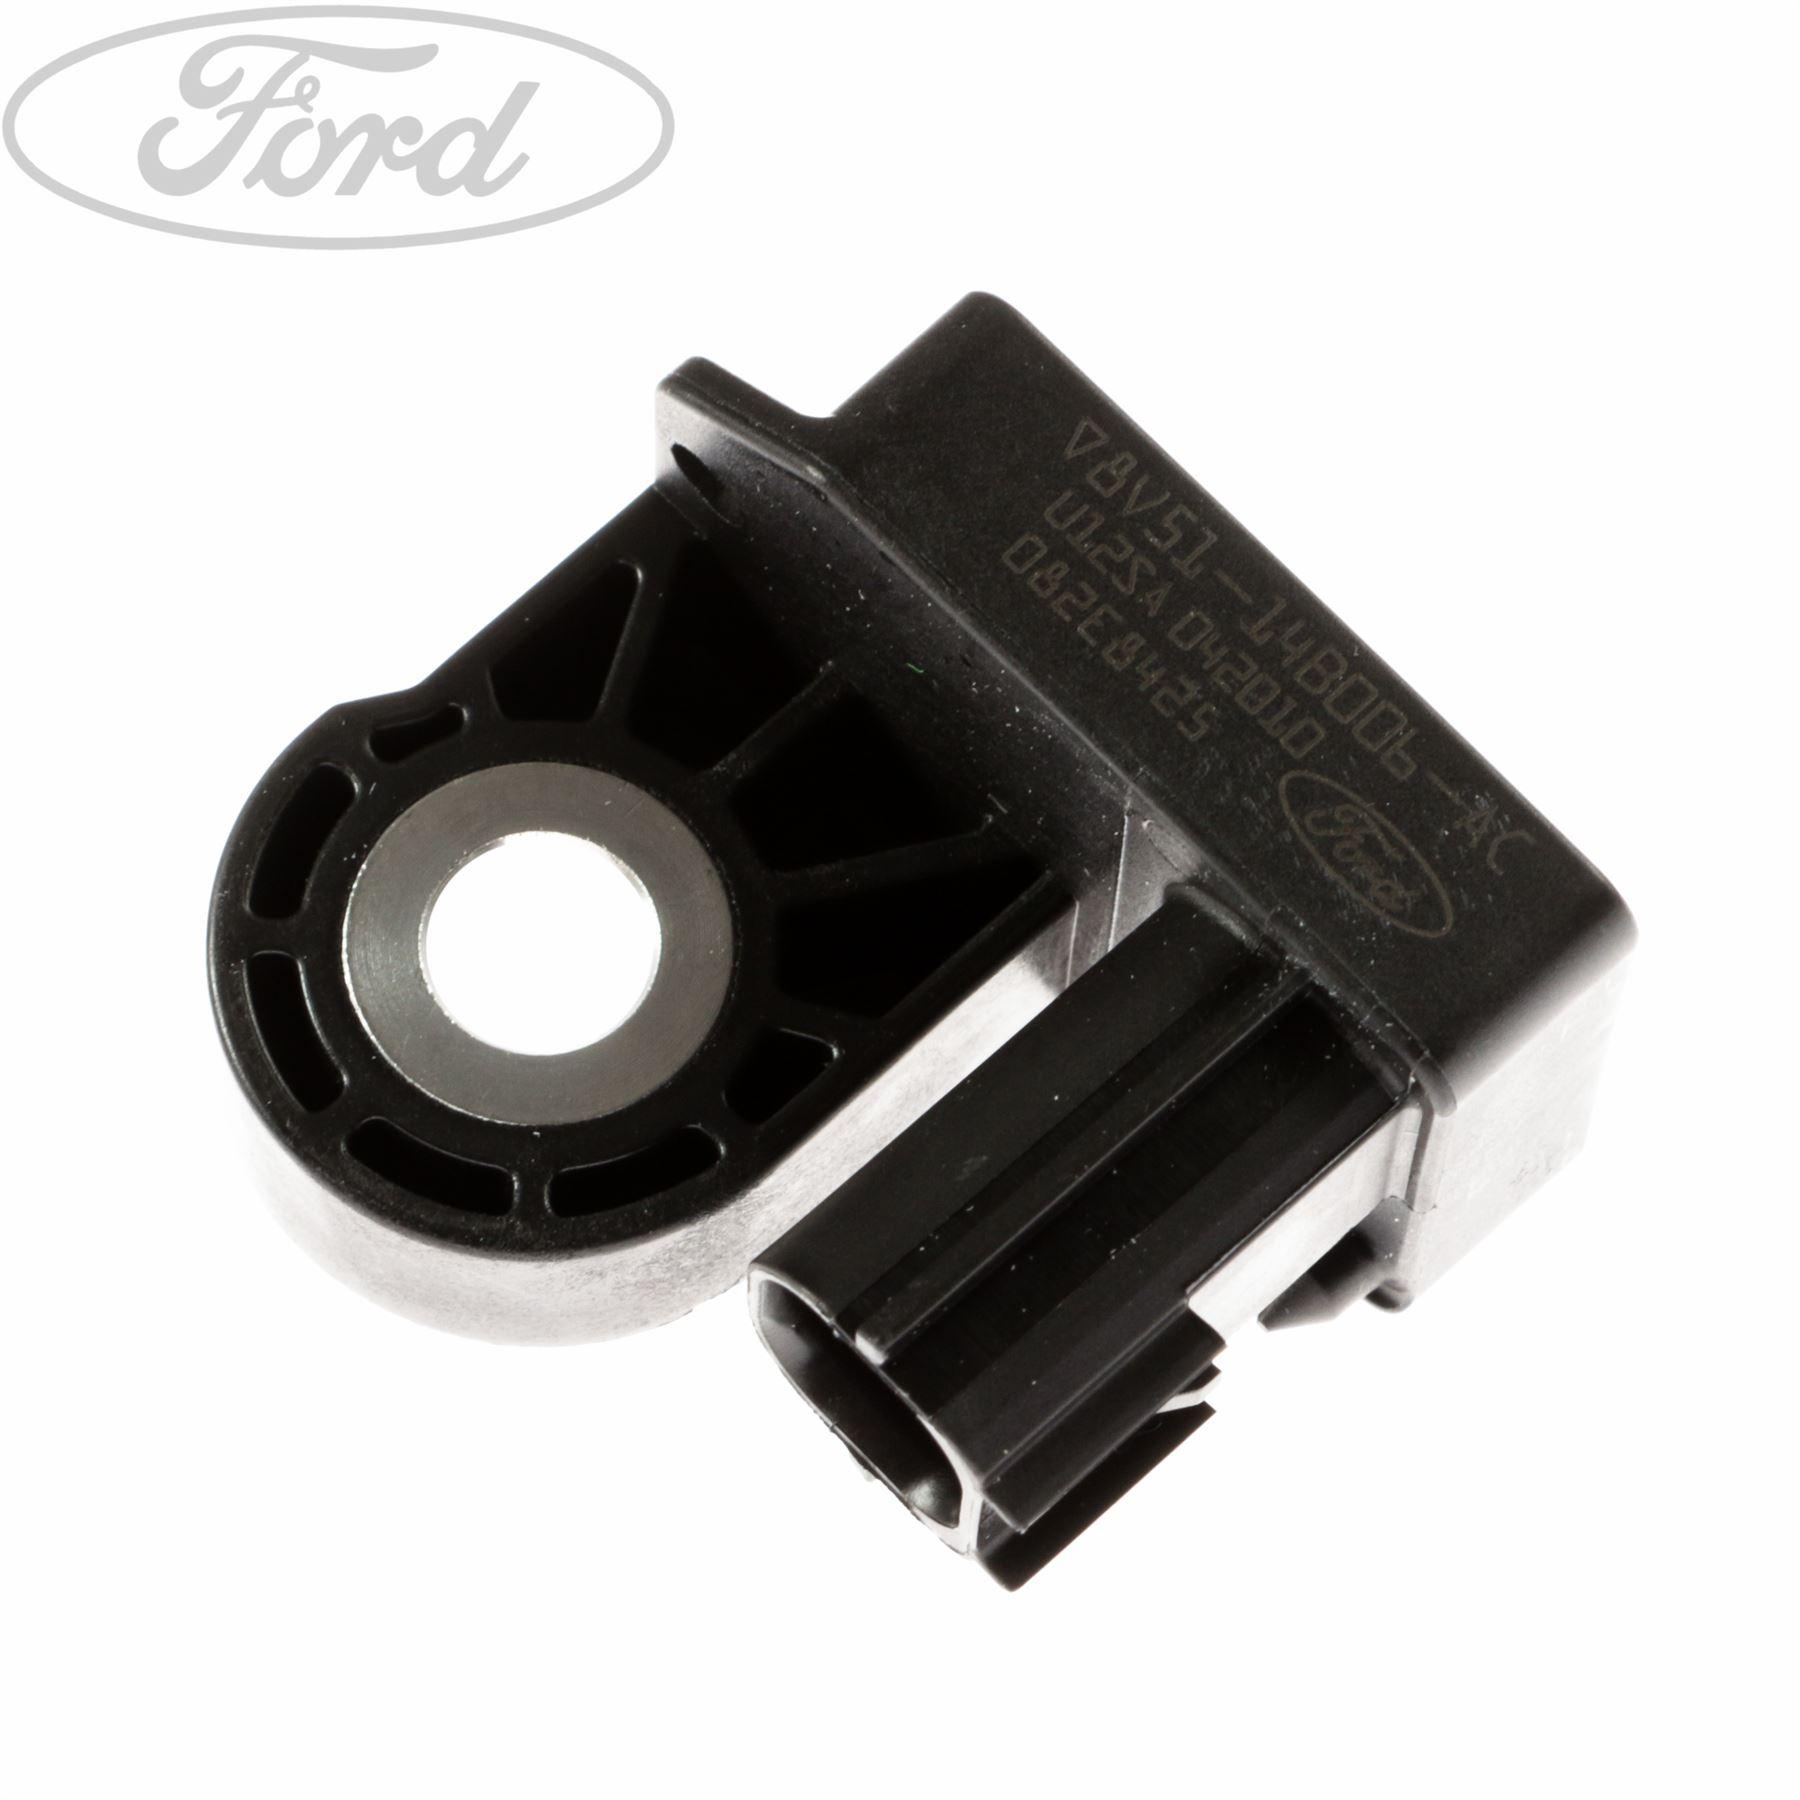 Car Interior Airbags, Sensors & Accessories Genuine Ford Air Bag ...